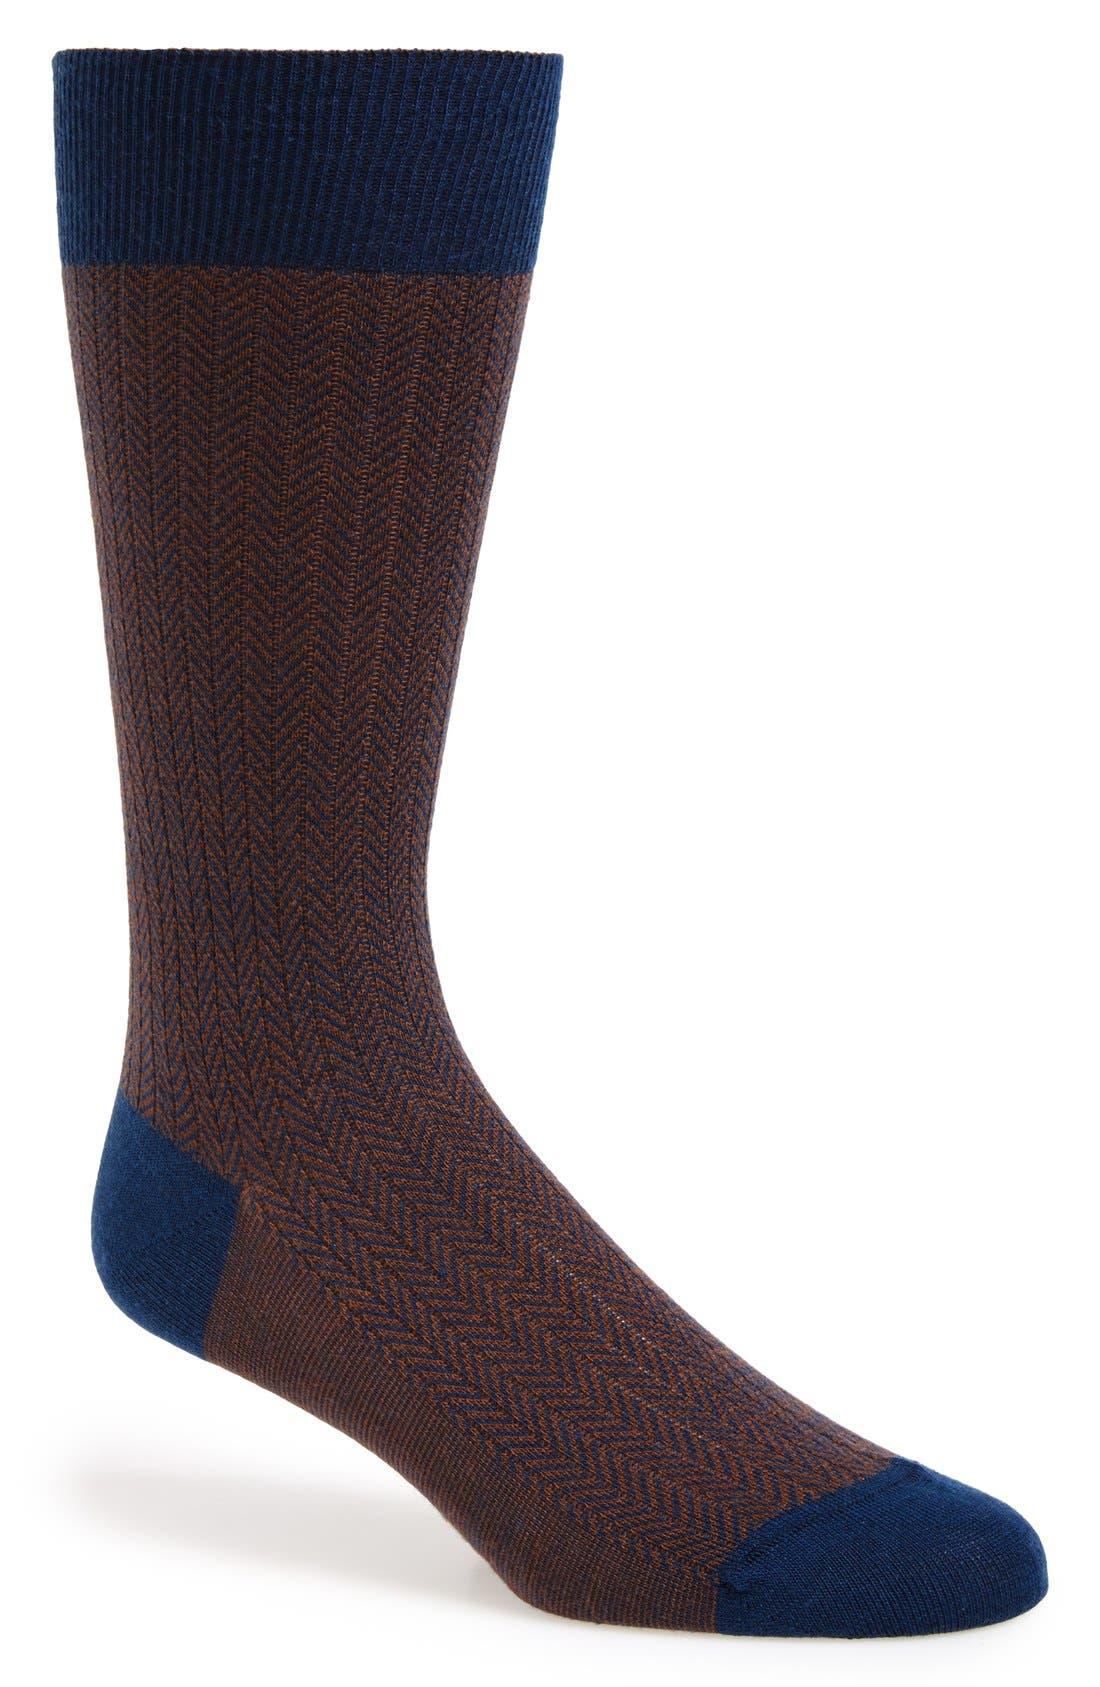 '5911' Mid-Calf Dress Socks,                             Main thumbnail 1, color,                             Dark Blue